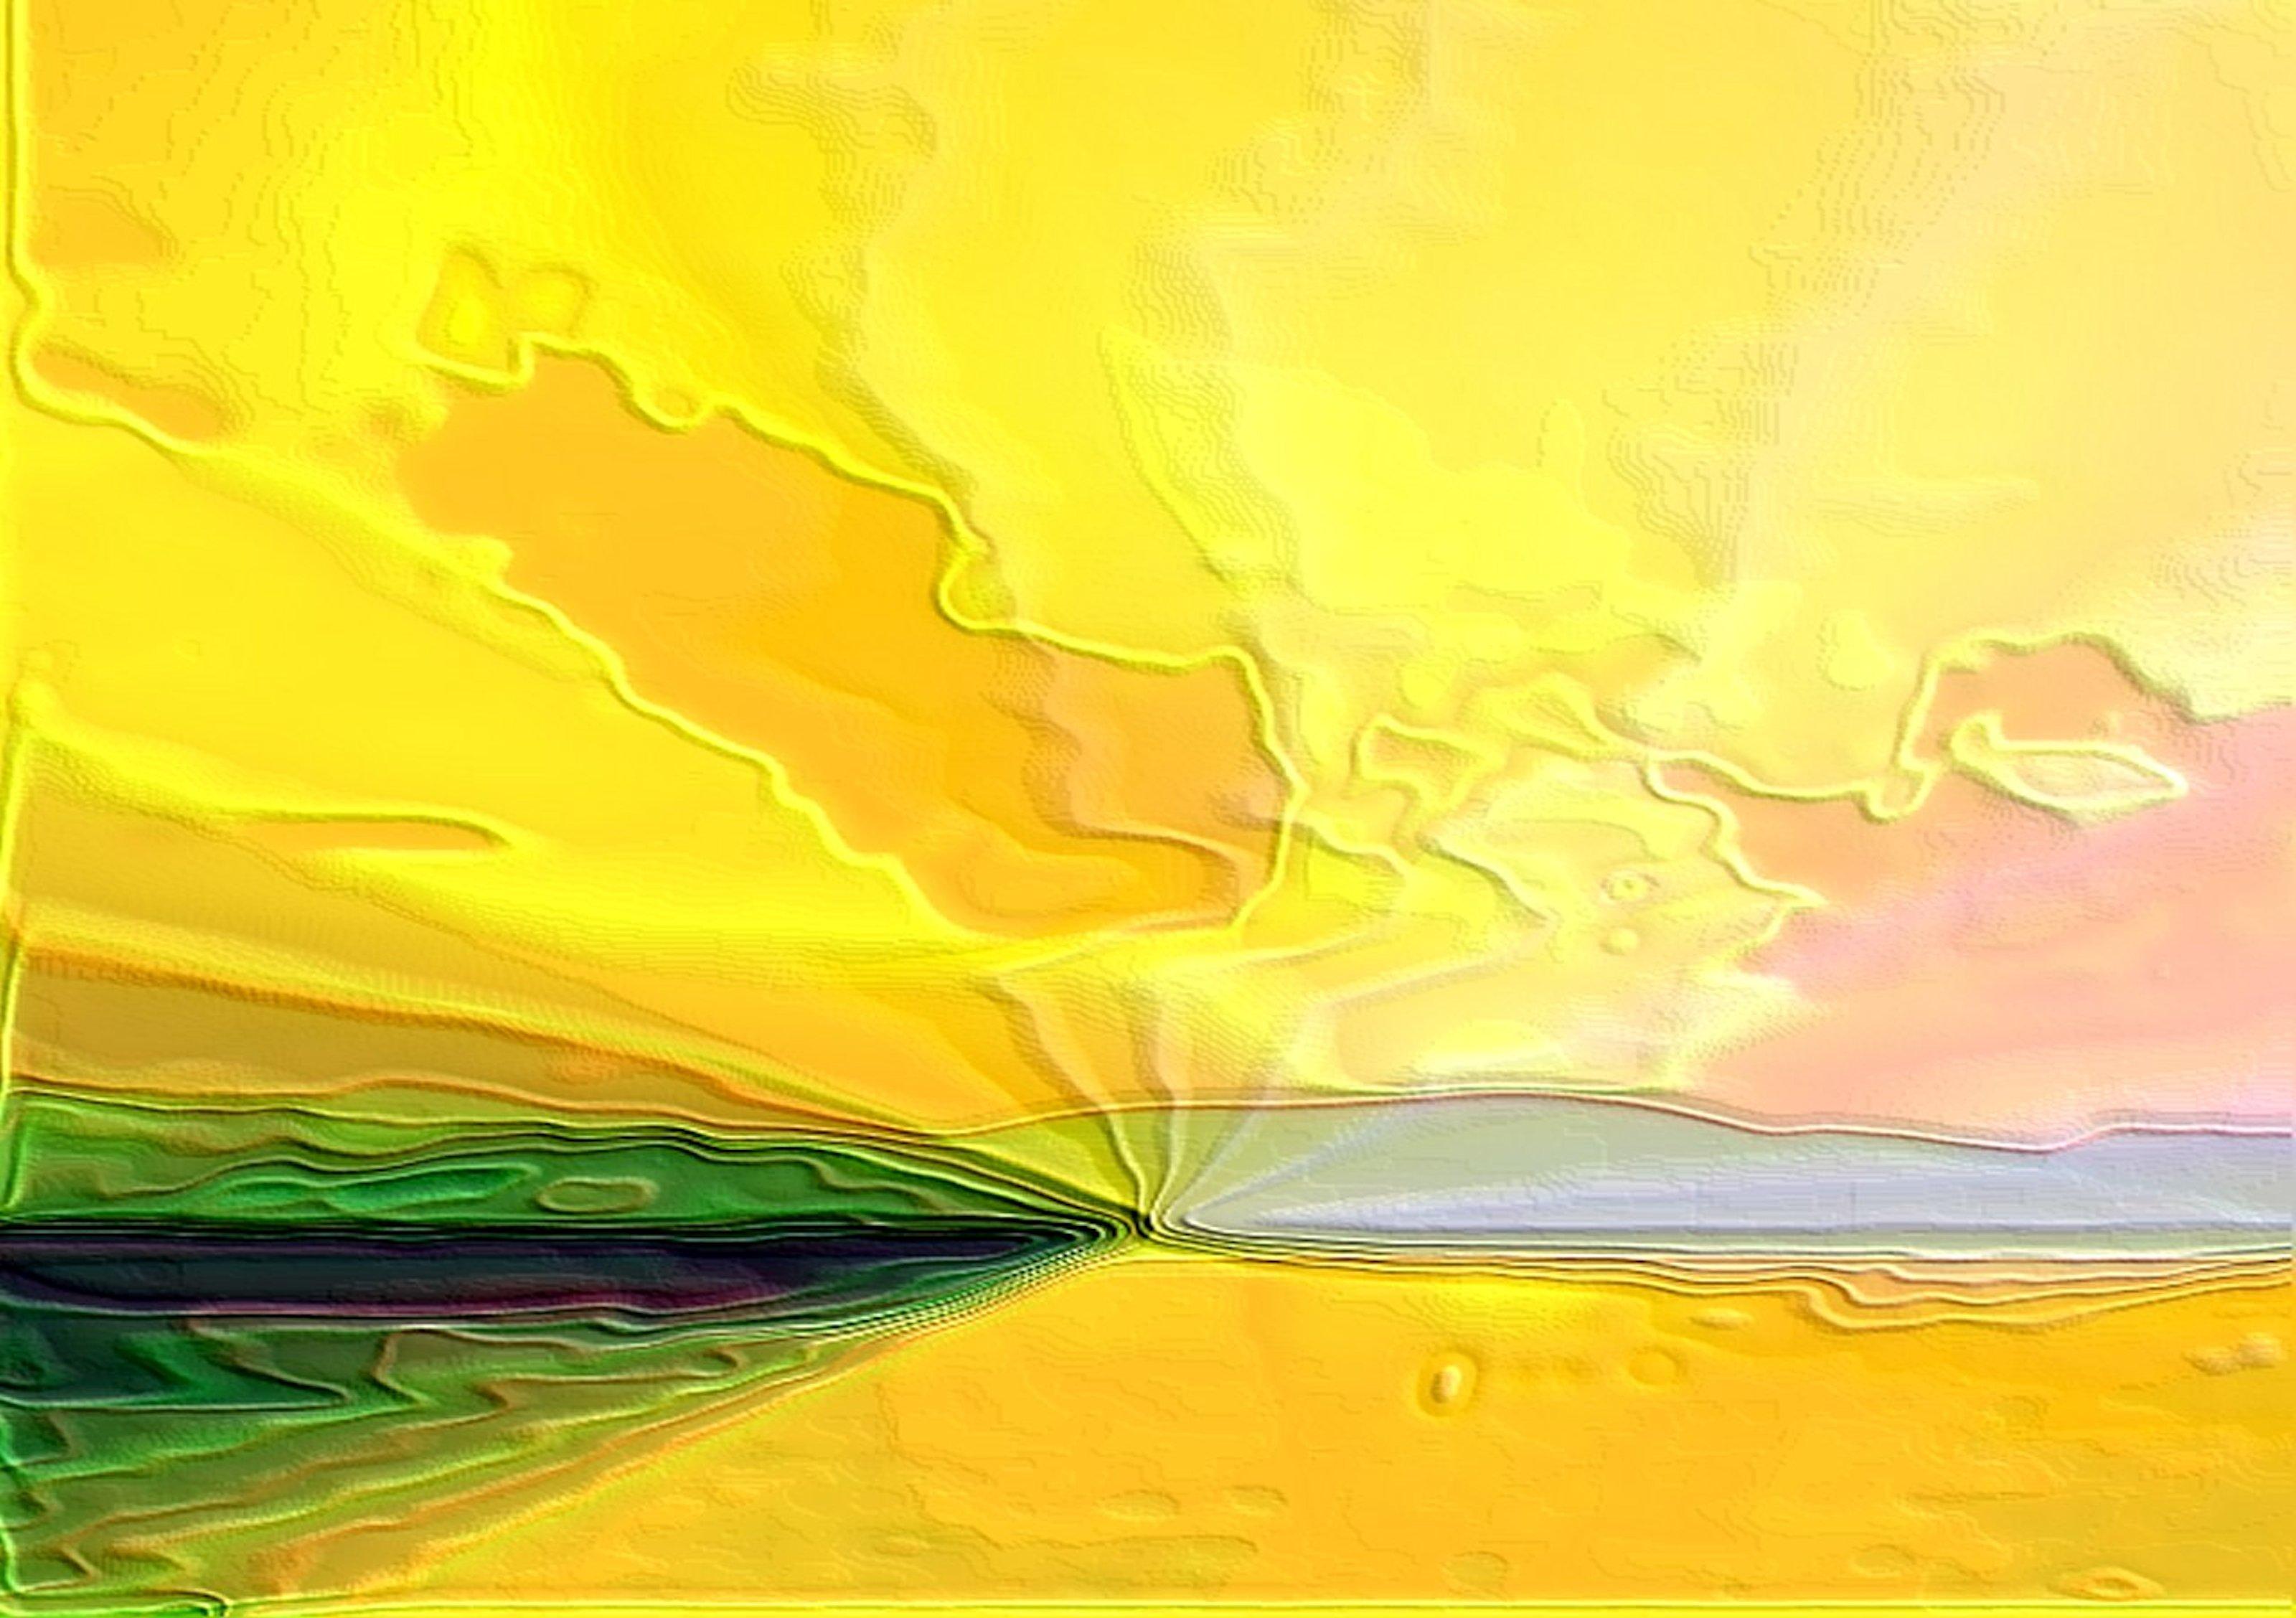 Yellow green island